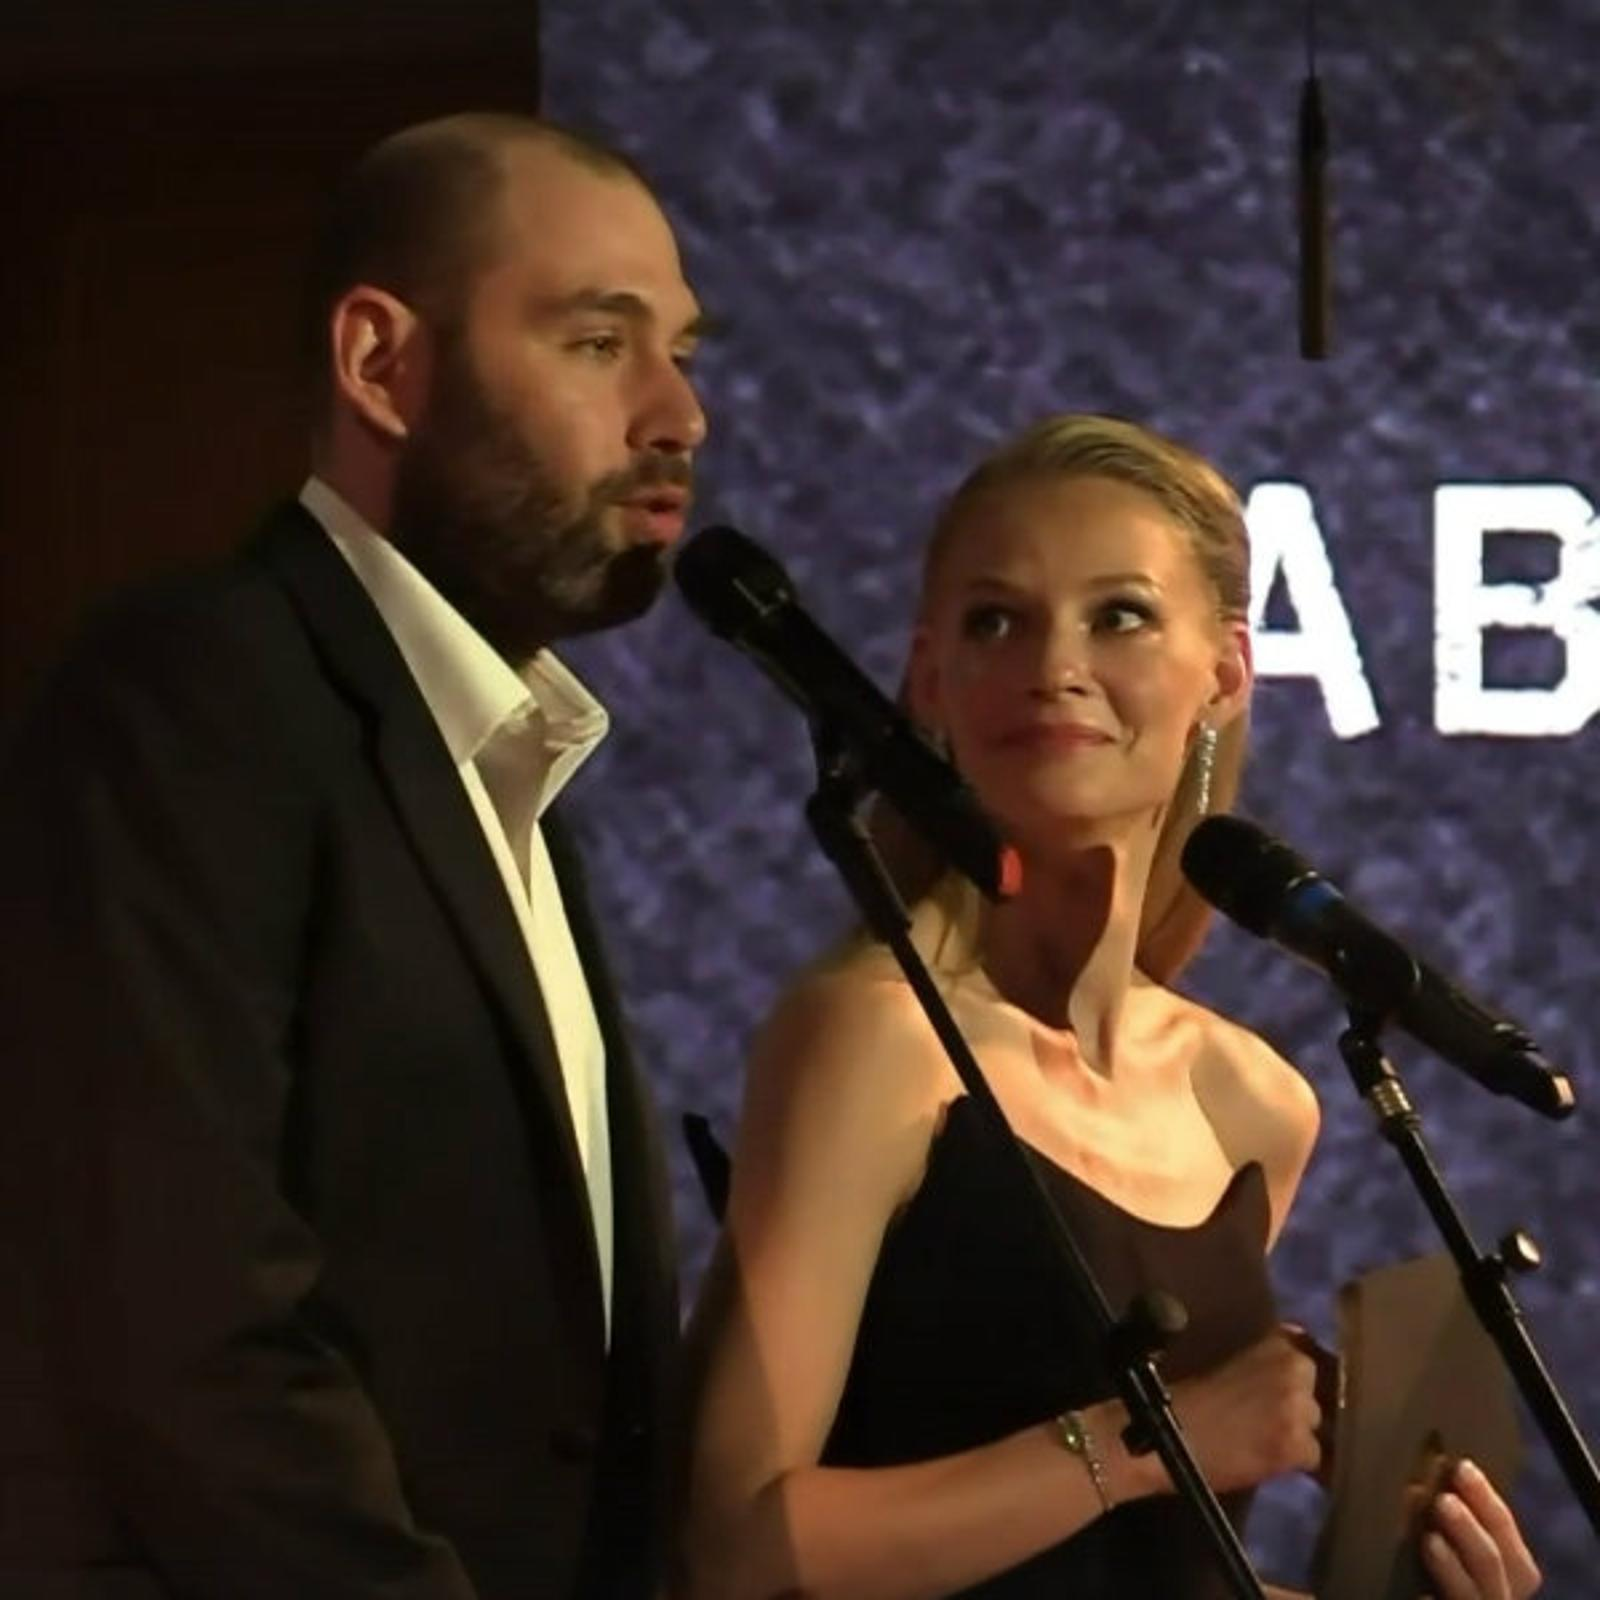 Светлана Ходченкова прокомментировала слухи о романе с Семеном Слепаковым